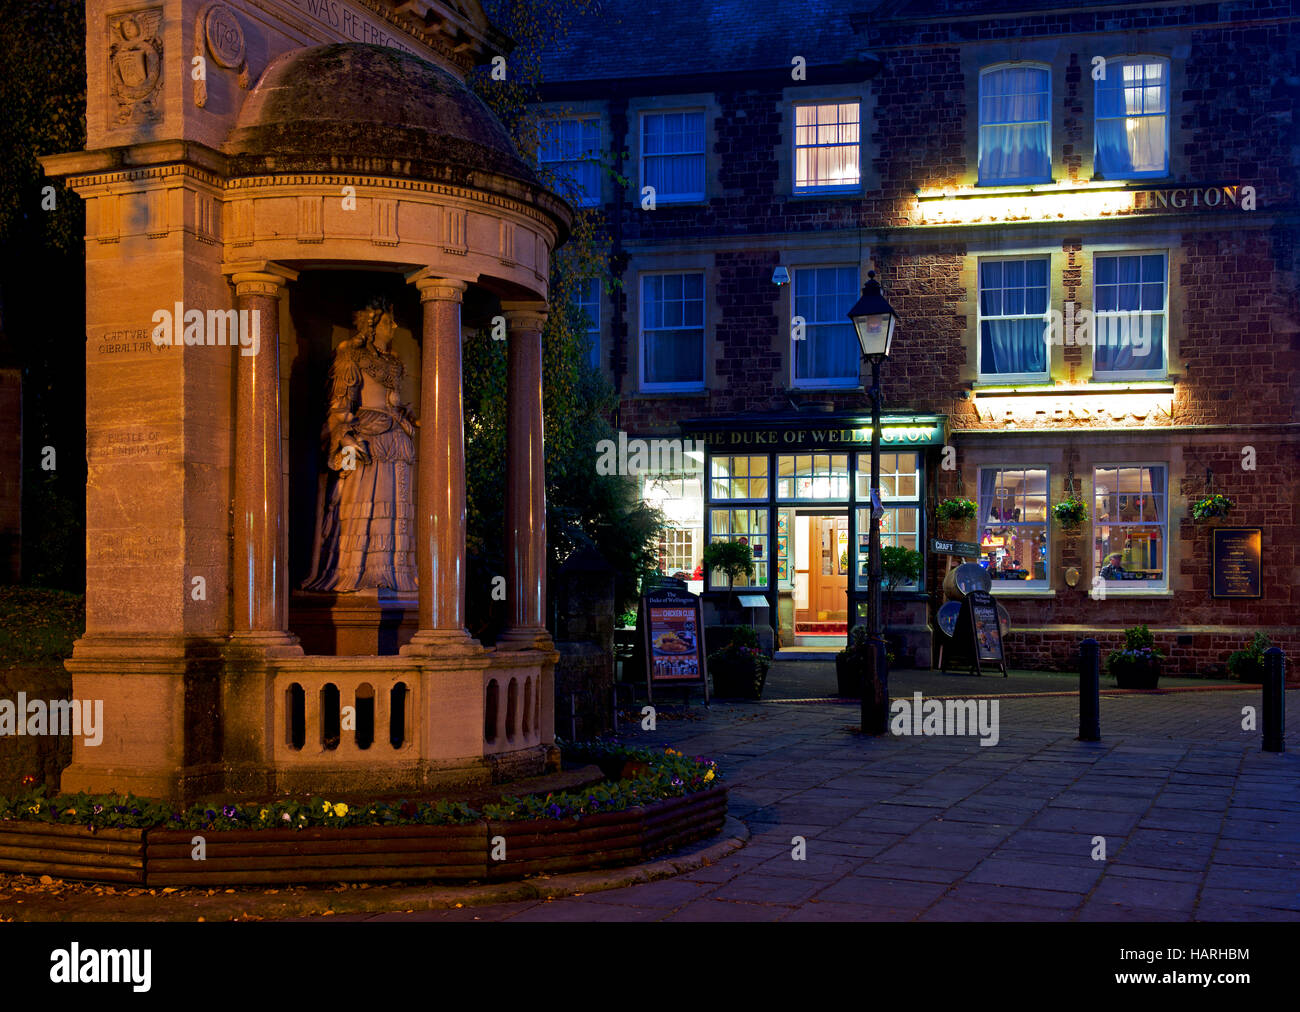 Wetherspoons pub in Minehead at night, Somerset, England UK - Stock Image